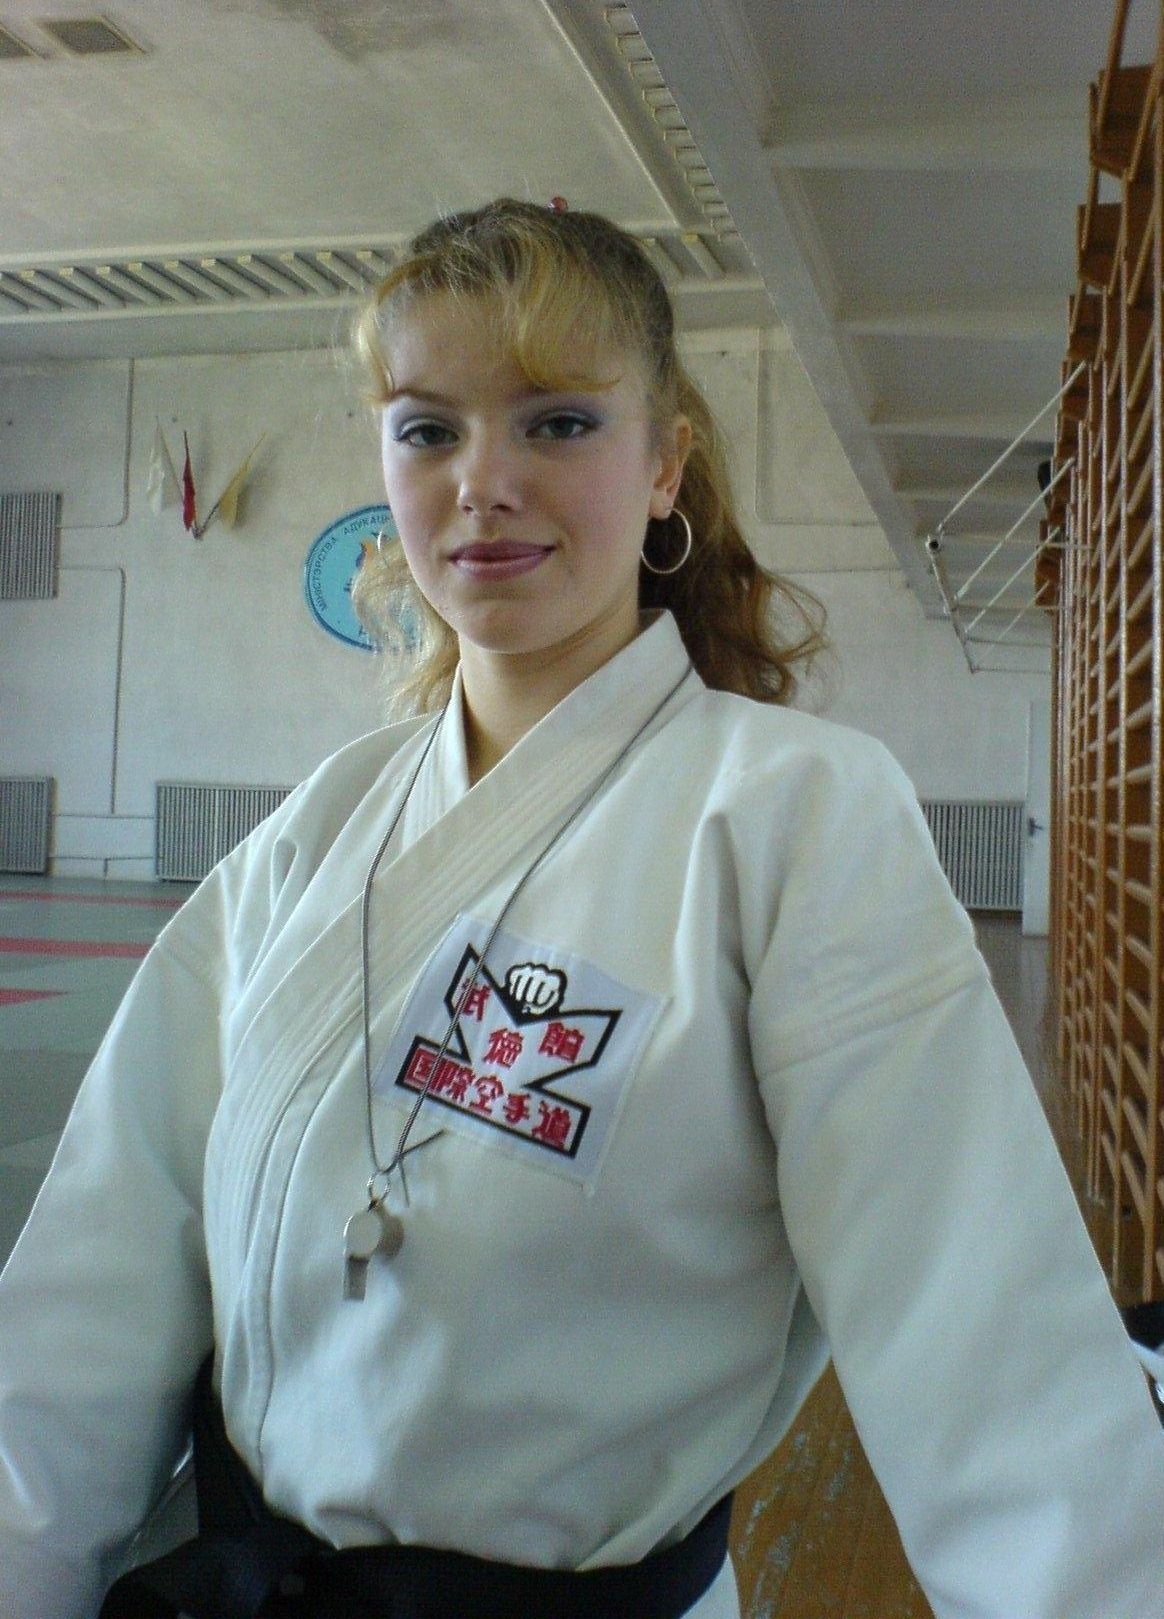 http://upload.wikimedia.org/wikipedia/commons/1/17/Liudmila_Andreevna_VEDERNIKOVA.jpg